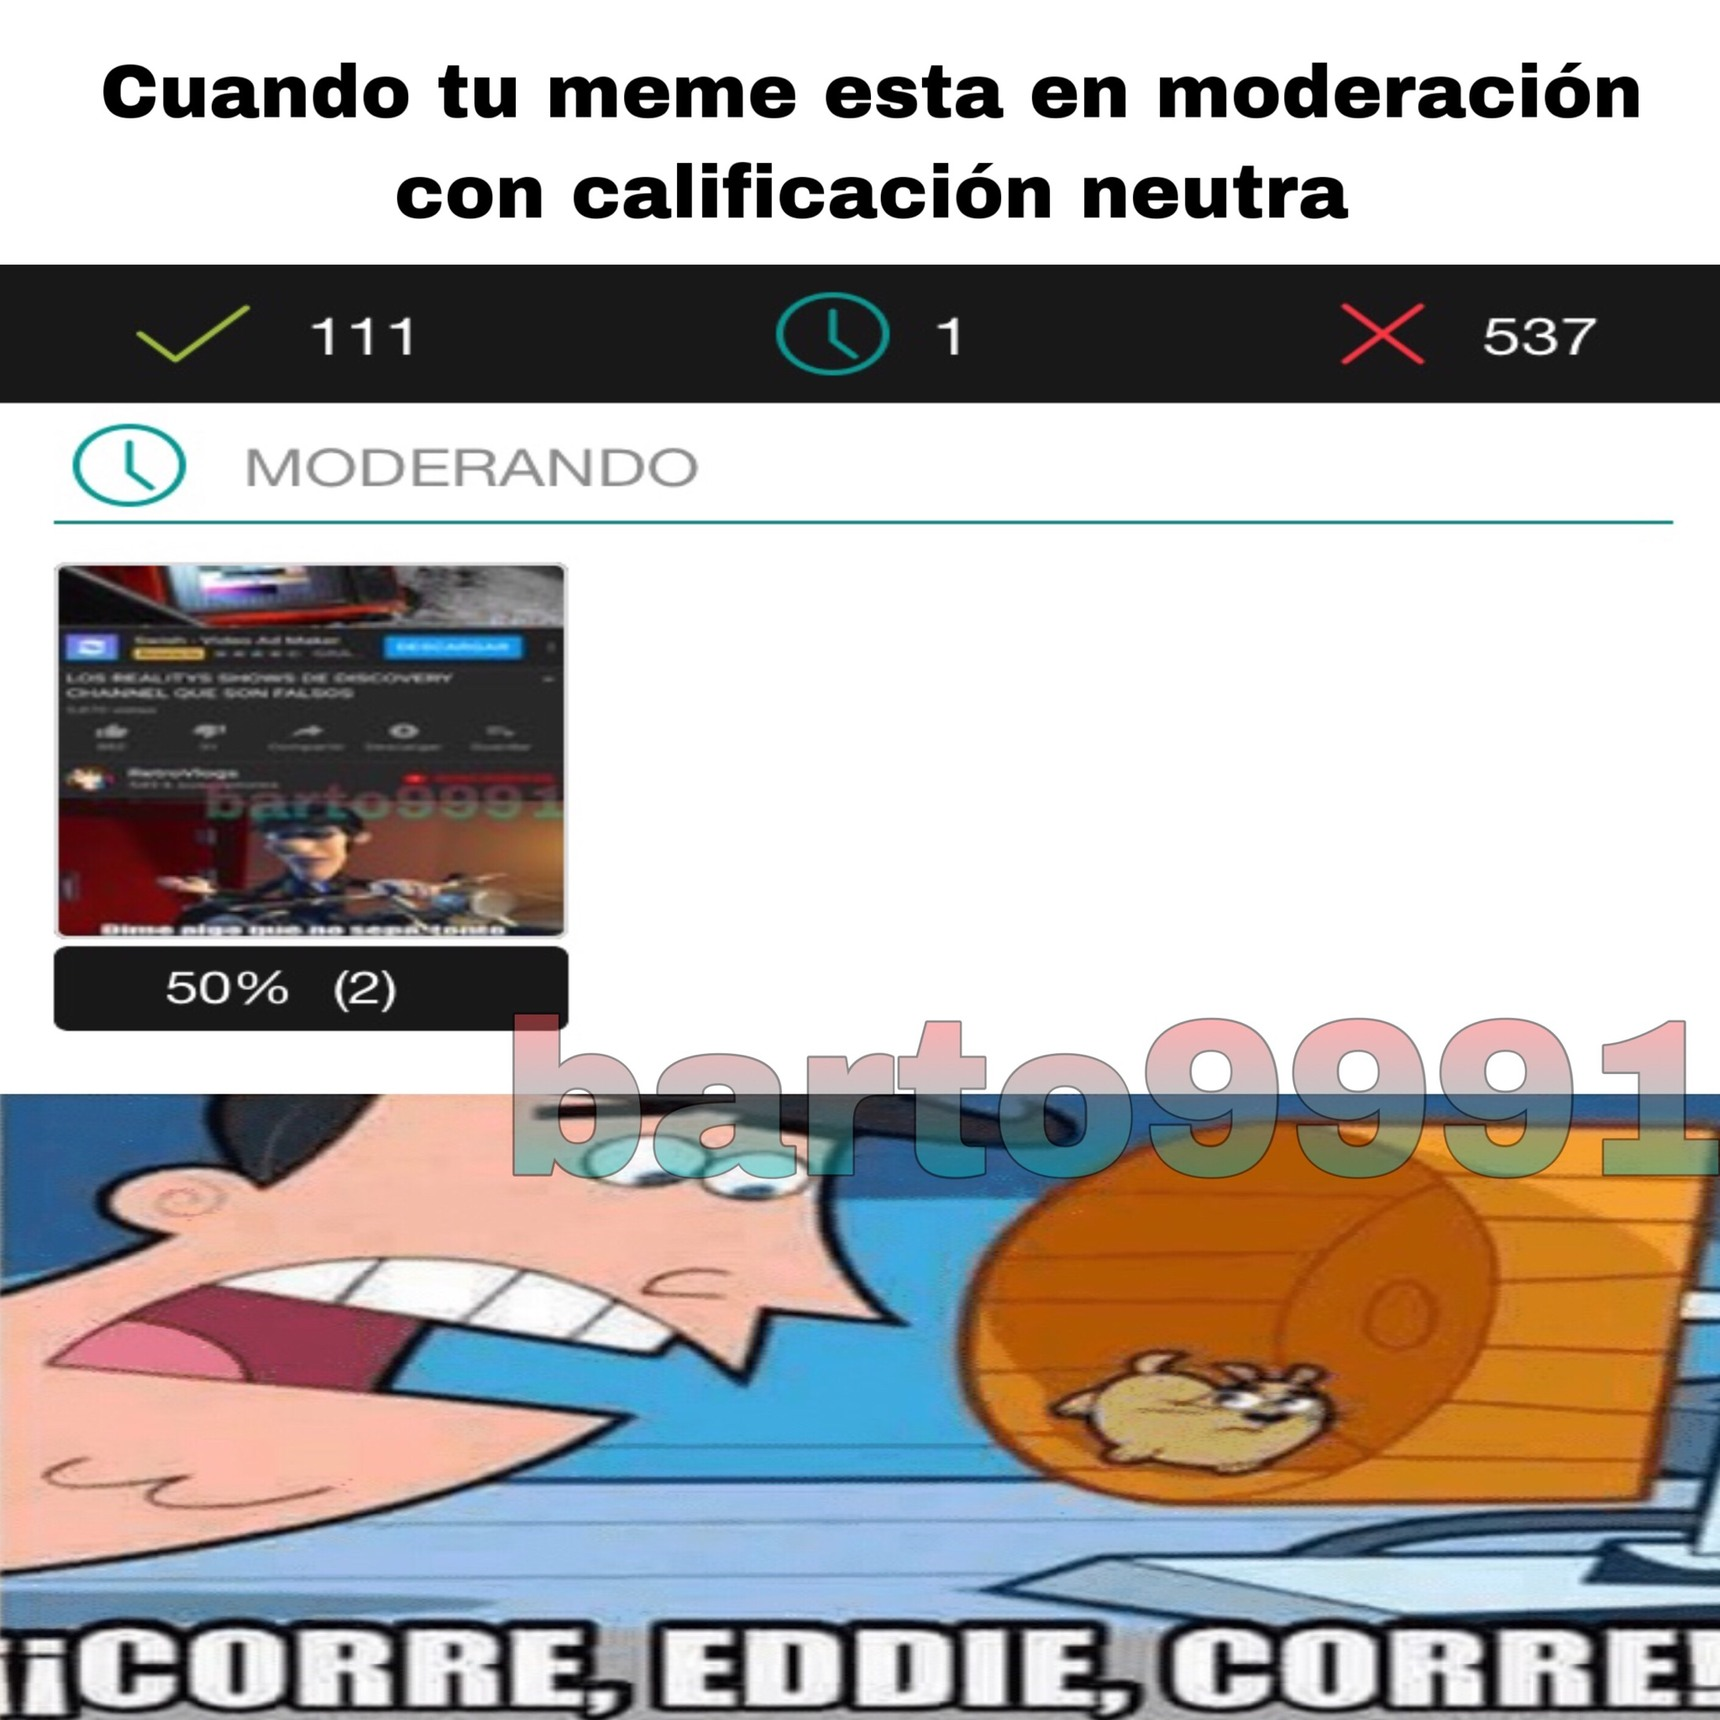 Un meme dentro de un meme= METAMEME